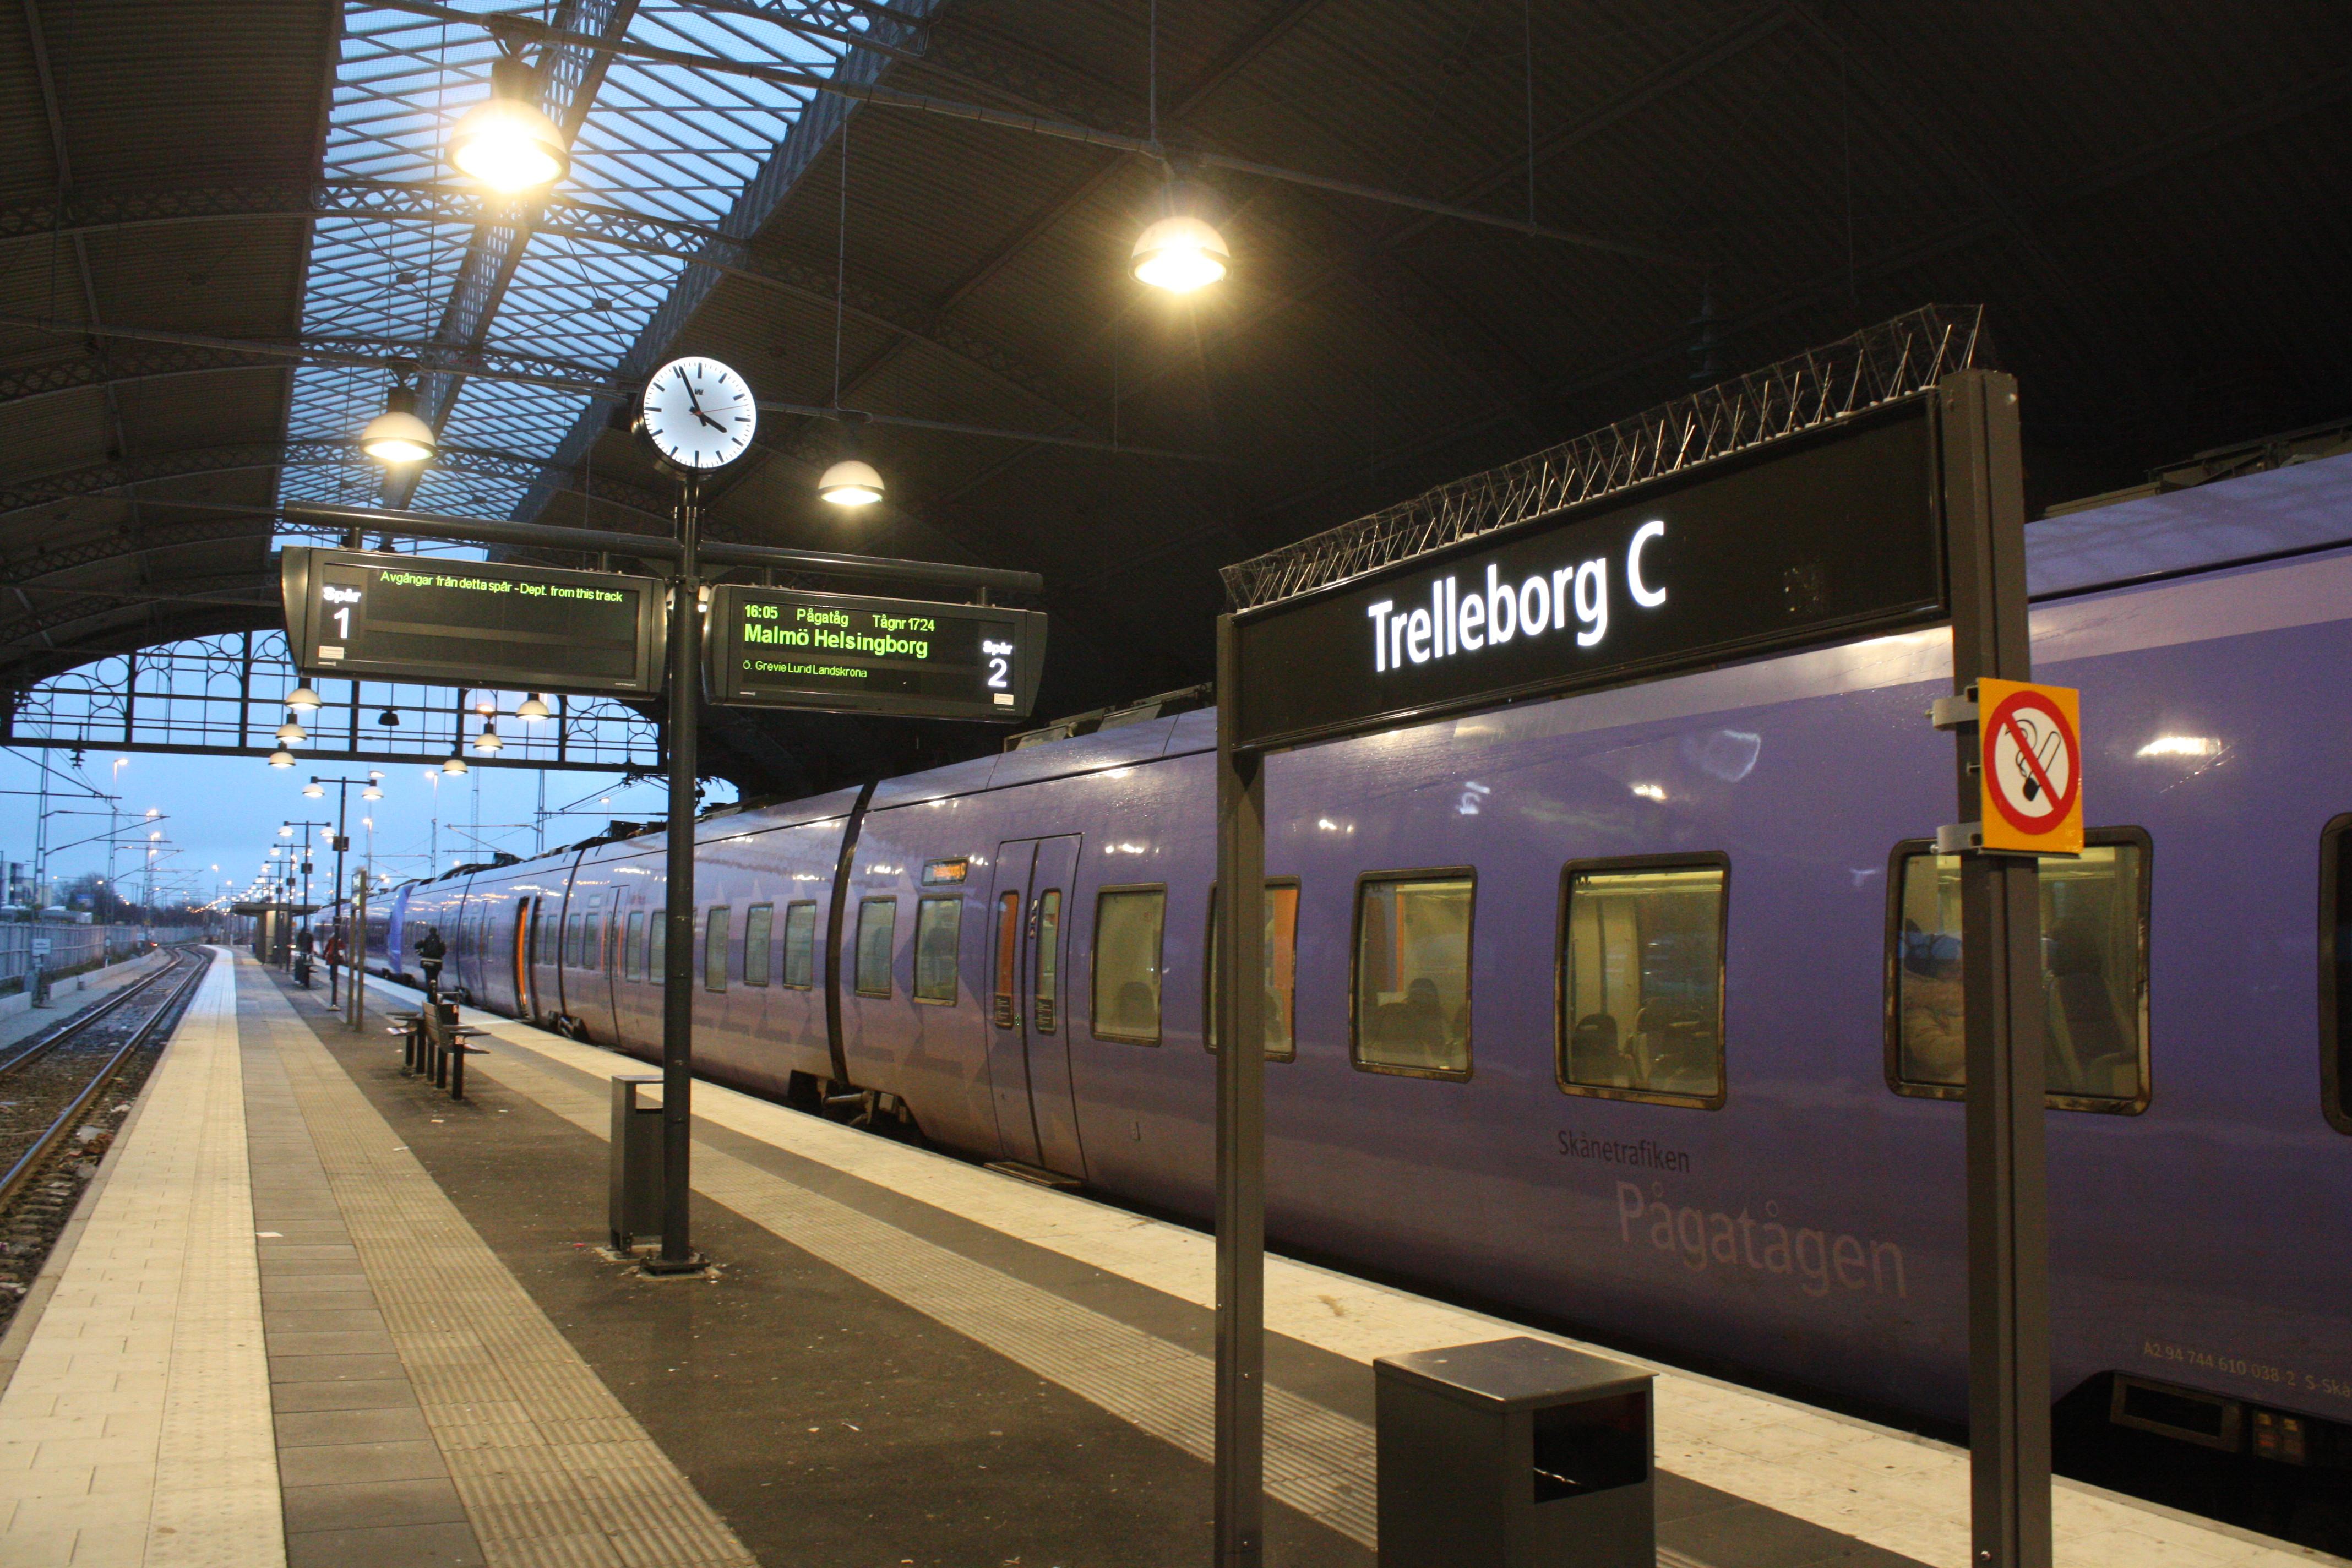 Filetrelleborg Centralstation 2jpg Wikimedia Commons